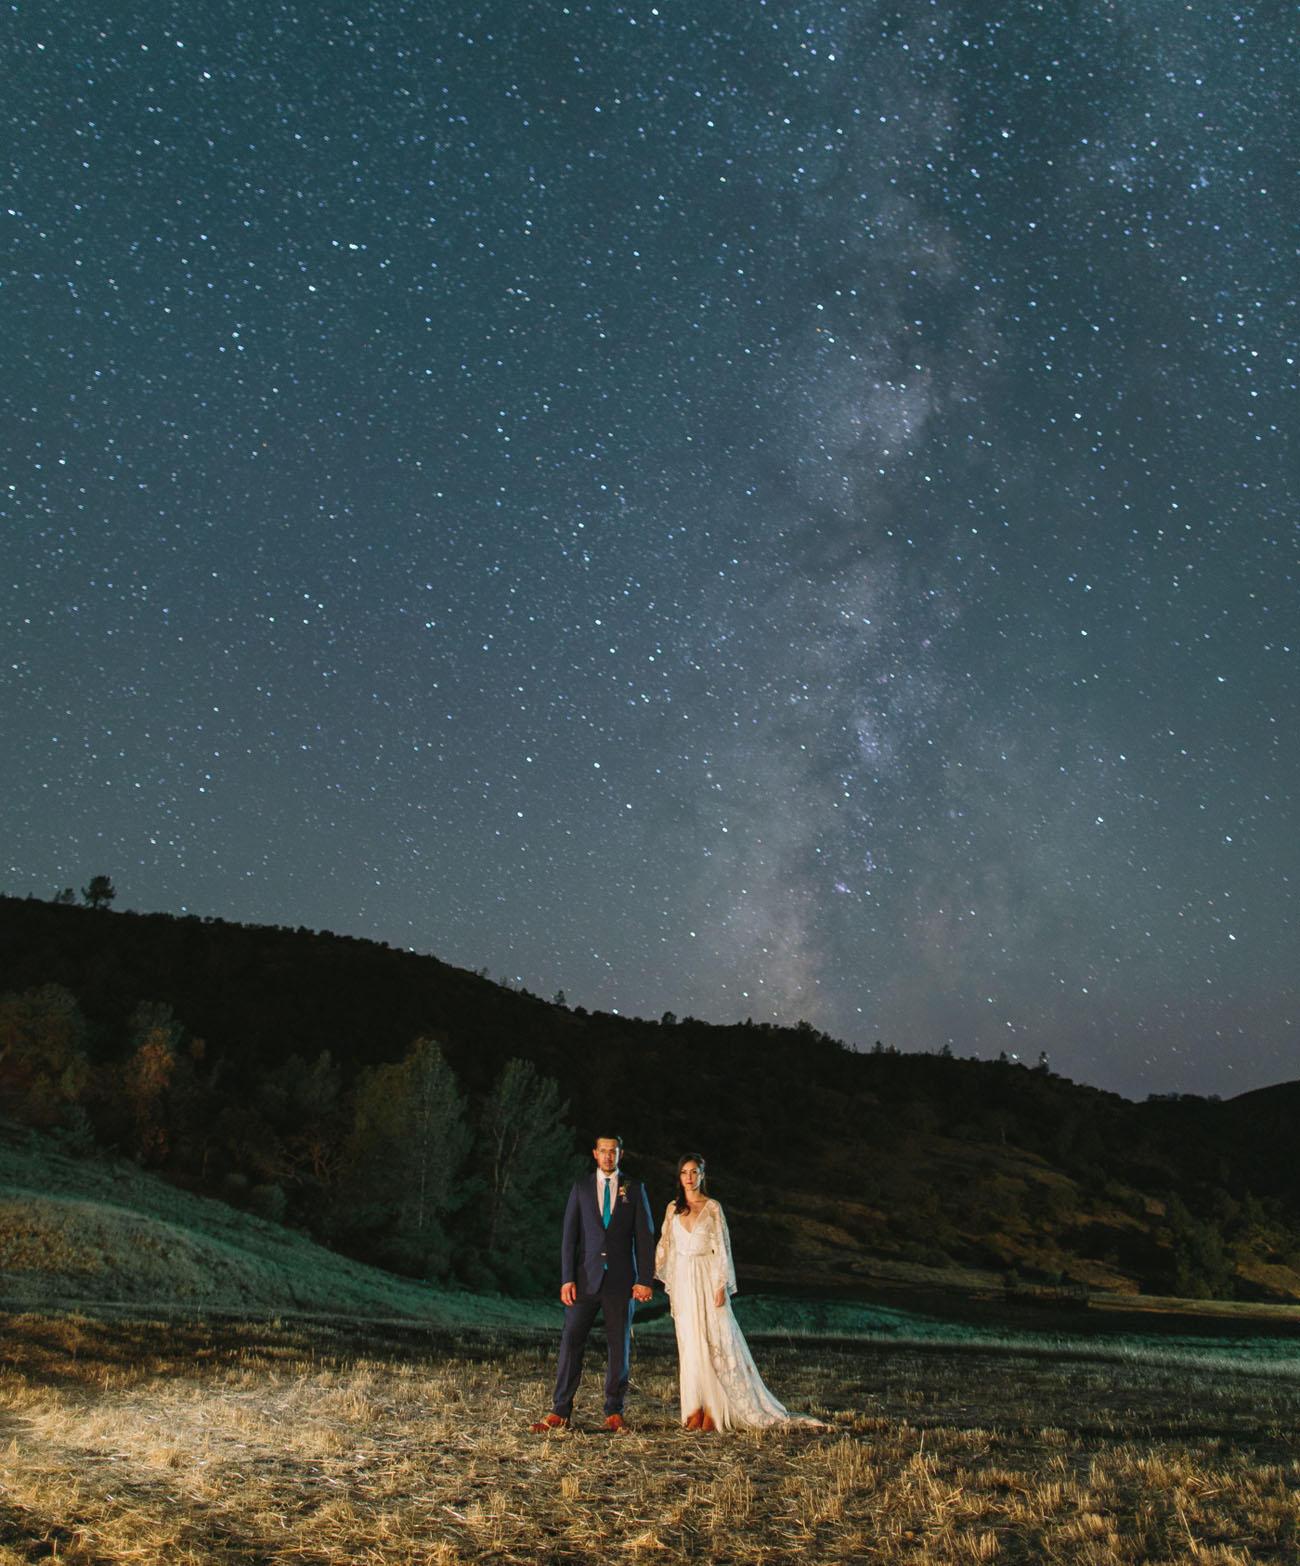 celestial wedding ideas under the stars